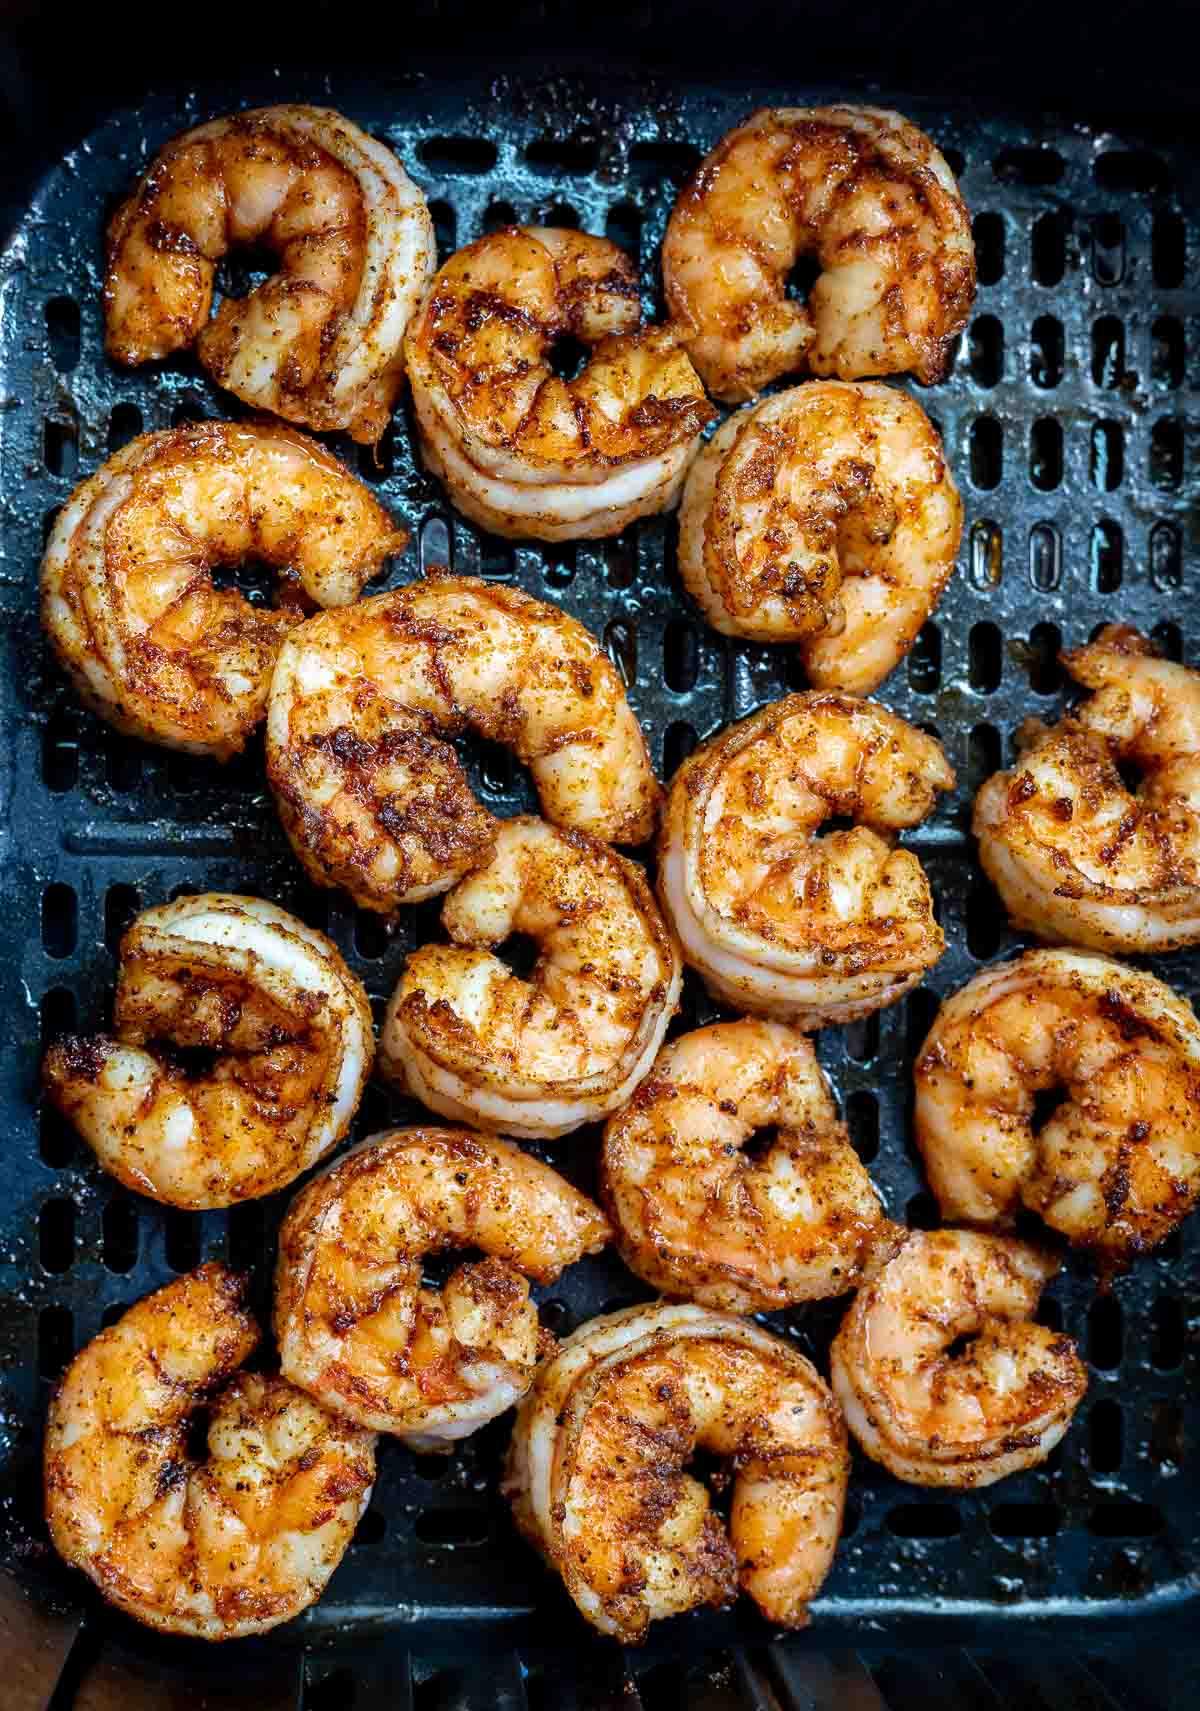 cooked spiced shrimp in air fryer basket